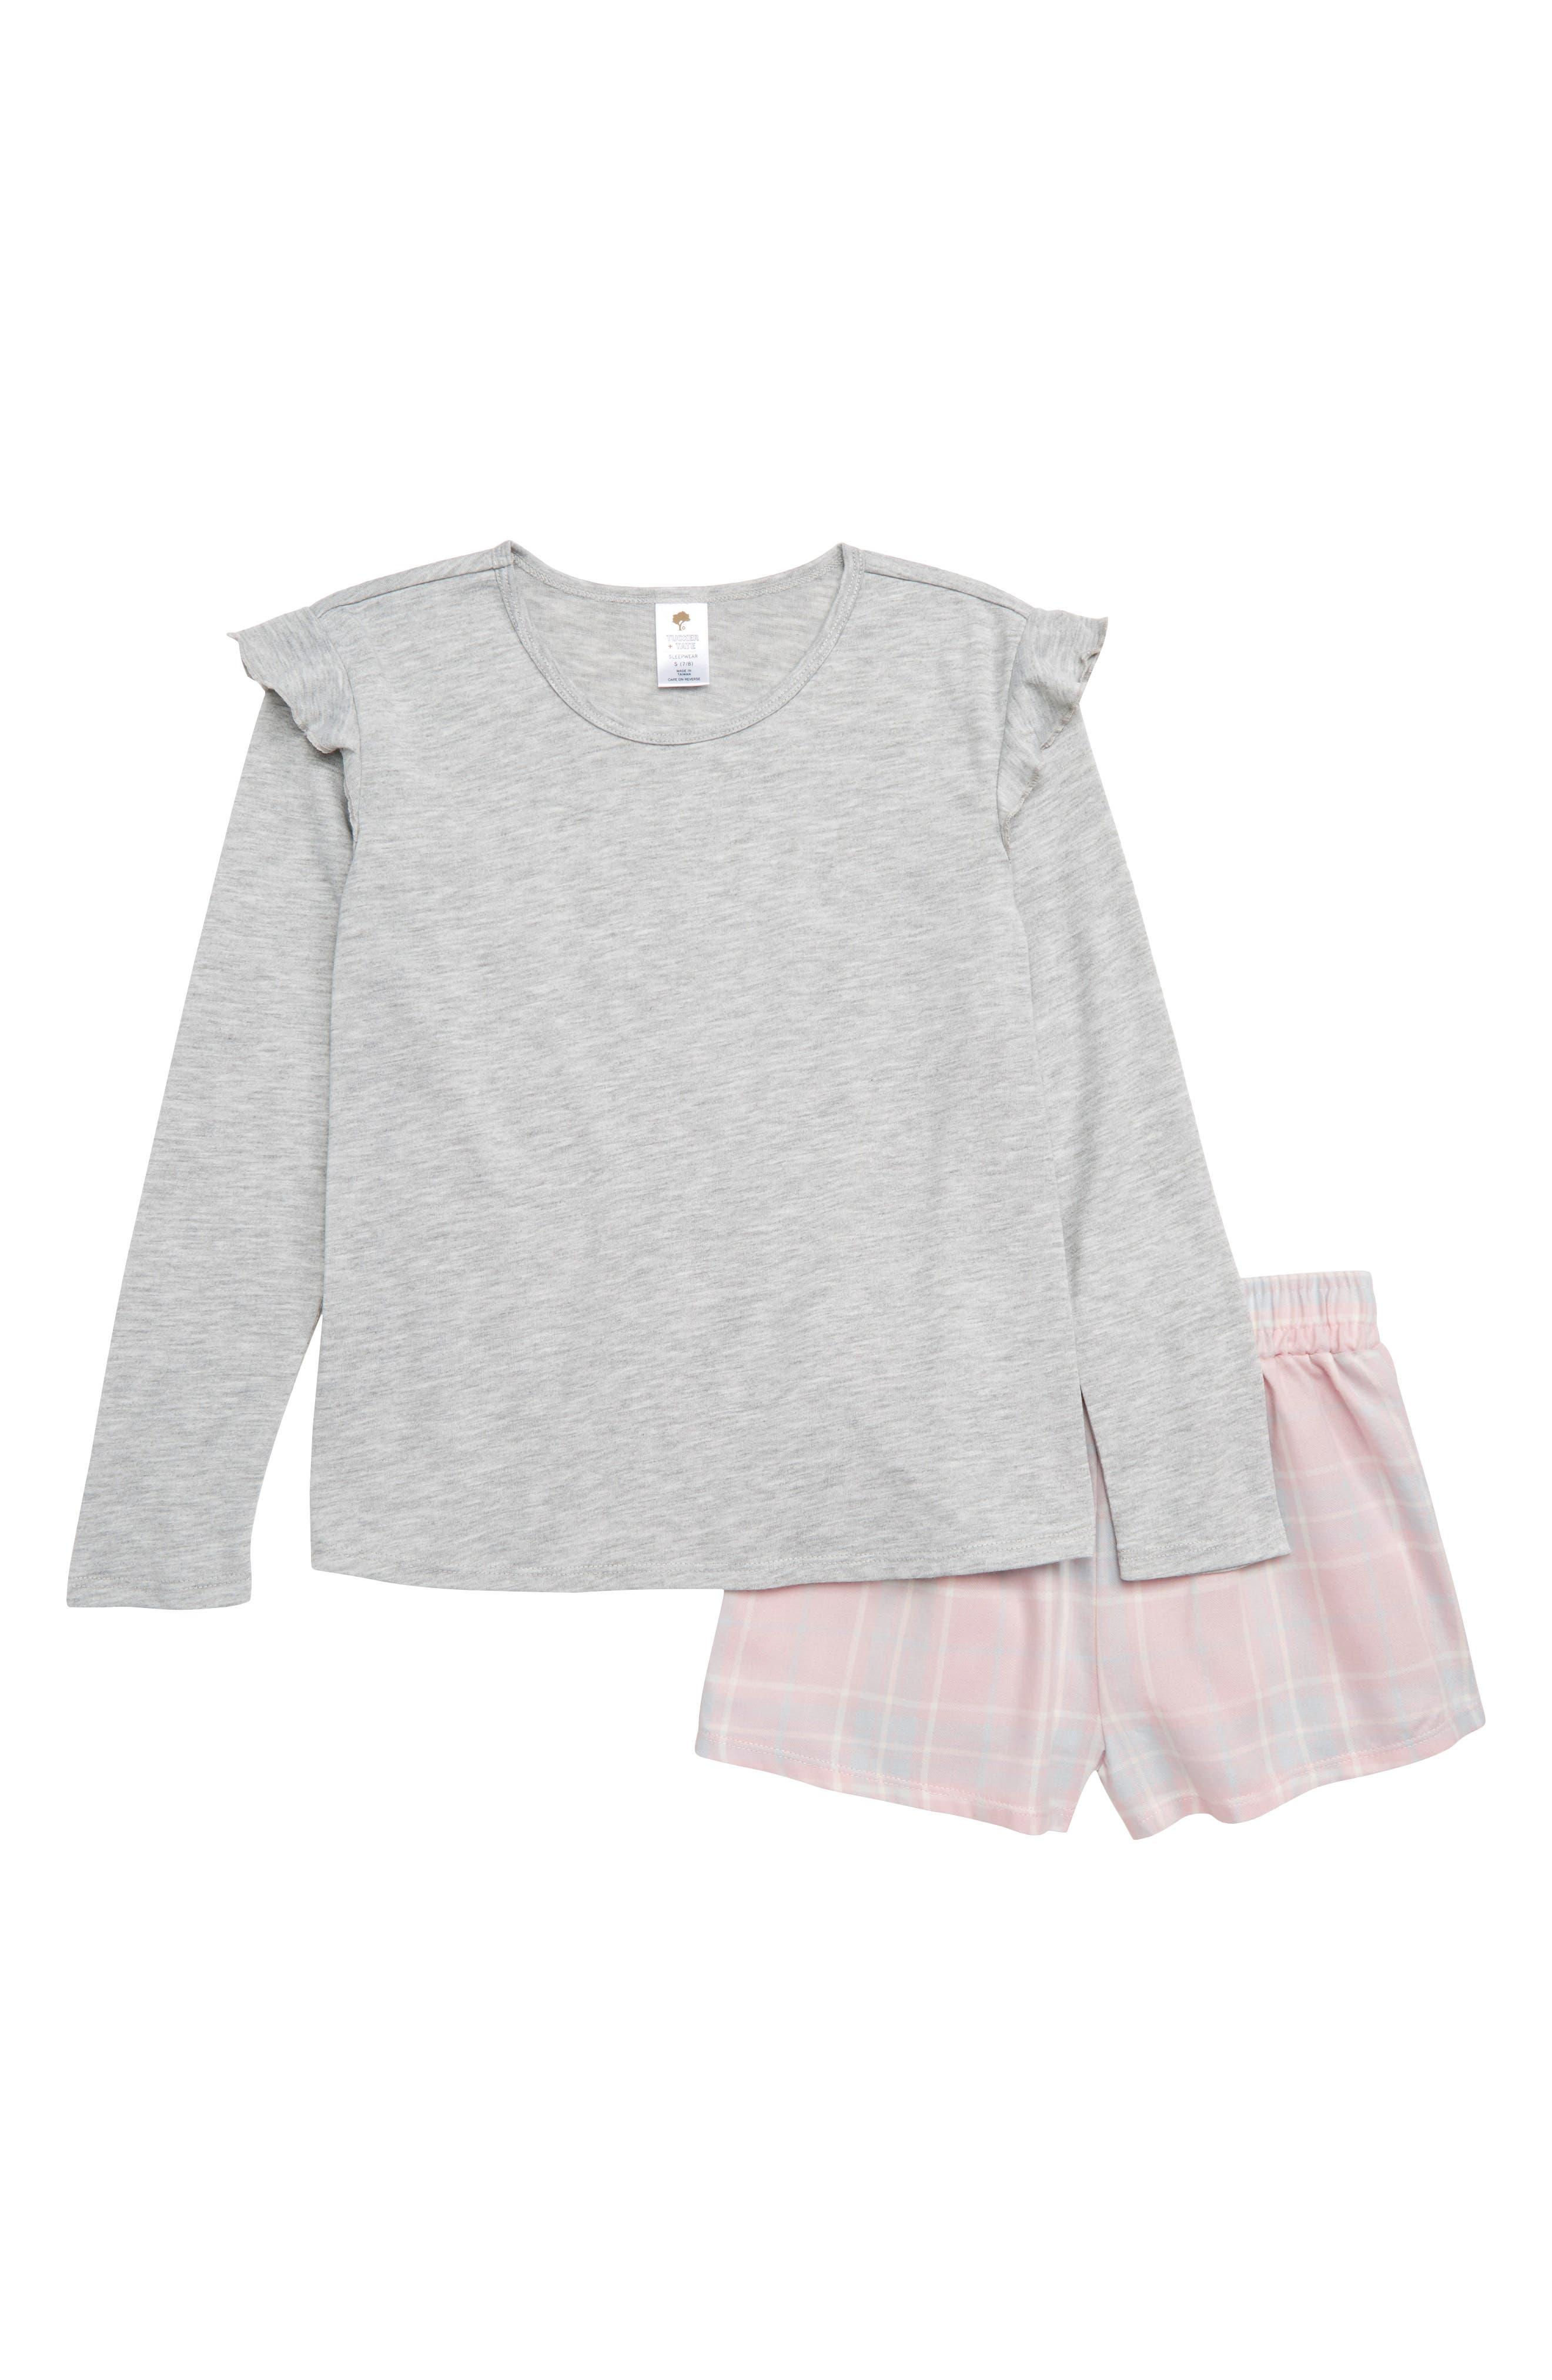 Tucker + Take Two-Piece Pajamas,                         Main,                         color, GREY ASH HEATHER- PINK PLAID